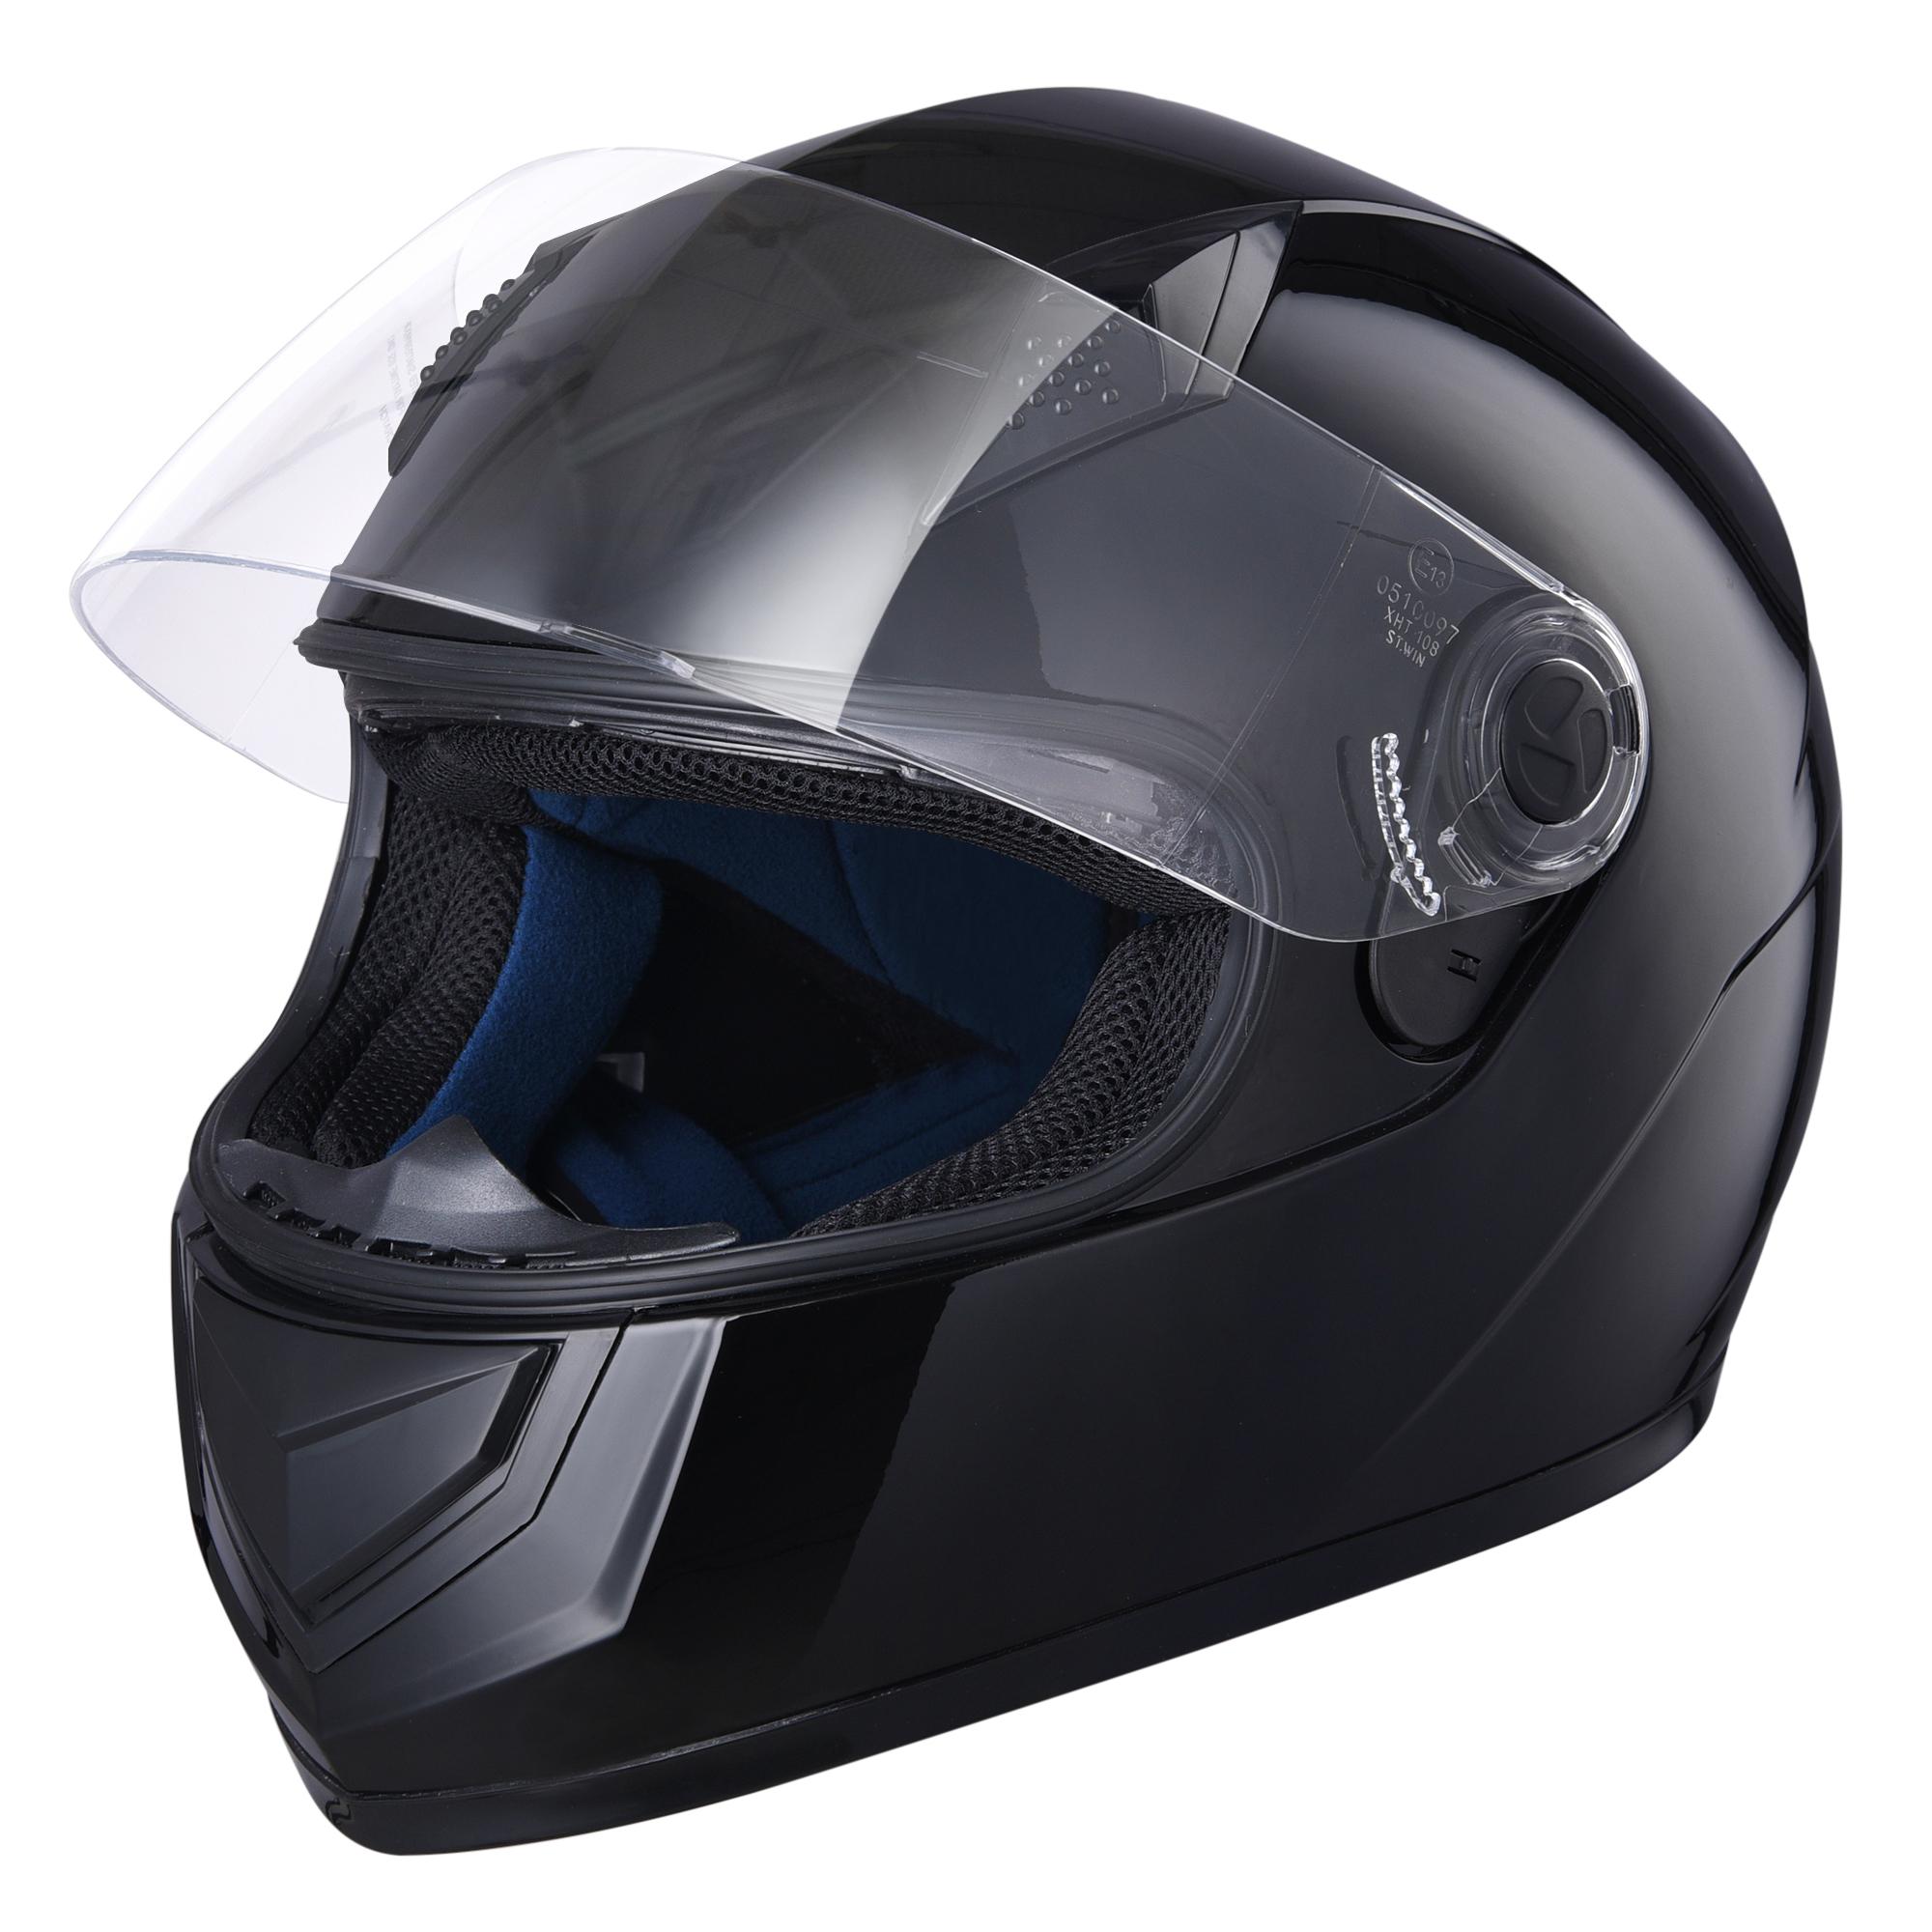 miniature 122 - AHR K12 Full Face Motorcycle Helmet DOT Air Vents Clear Visor Racing S M L XL